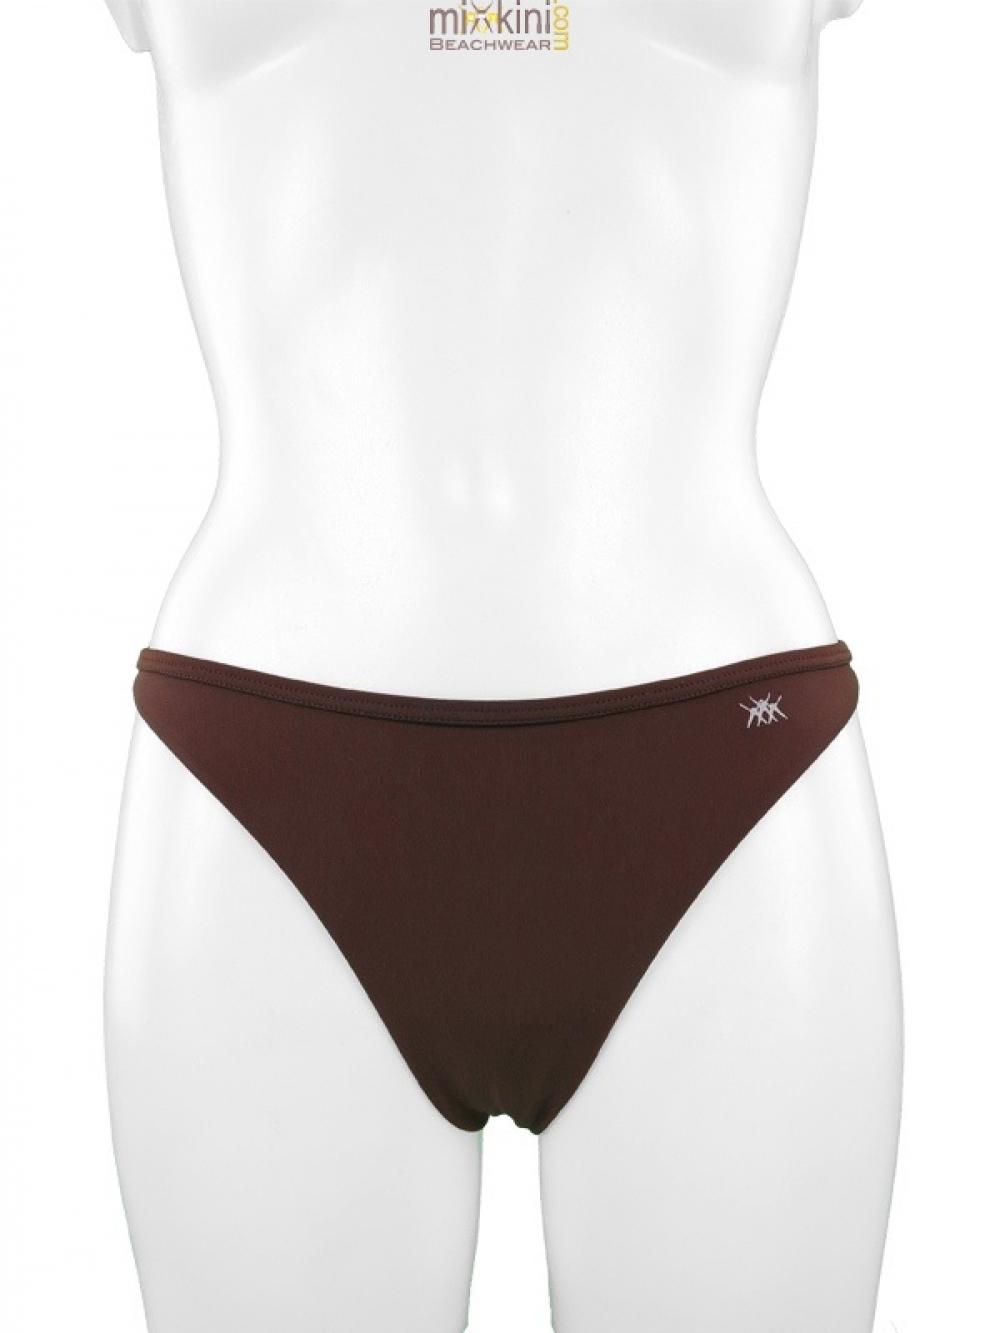 string bikini braun string tanga braun kaufen mixkini. Black Bedroom Furniture Sets. Home Design Ideas